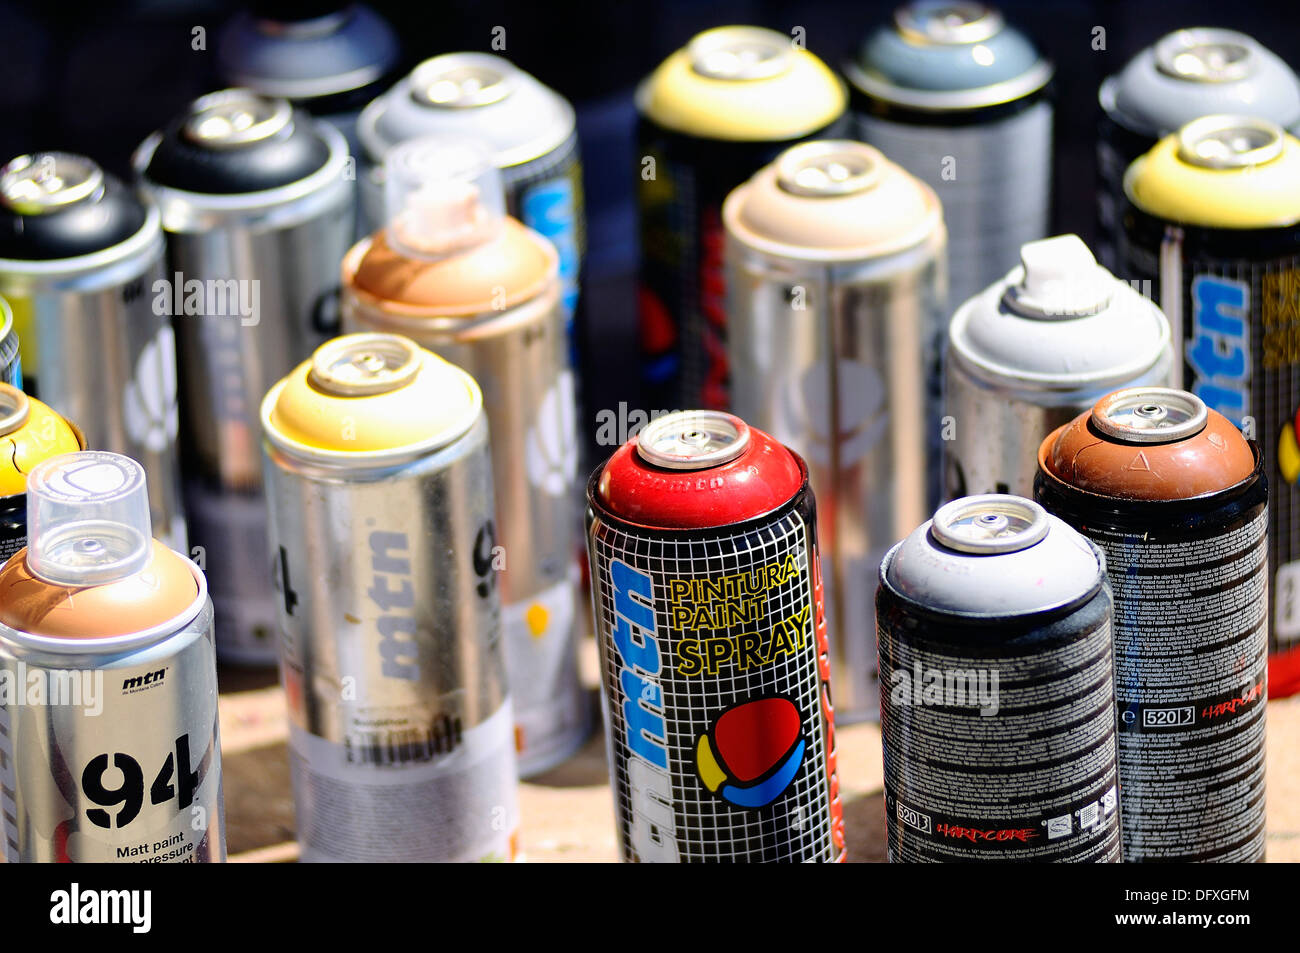 Aerosol cans to paint graffiti - Stock Image